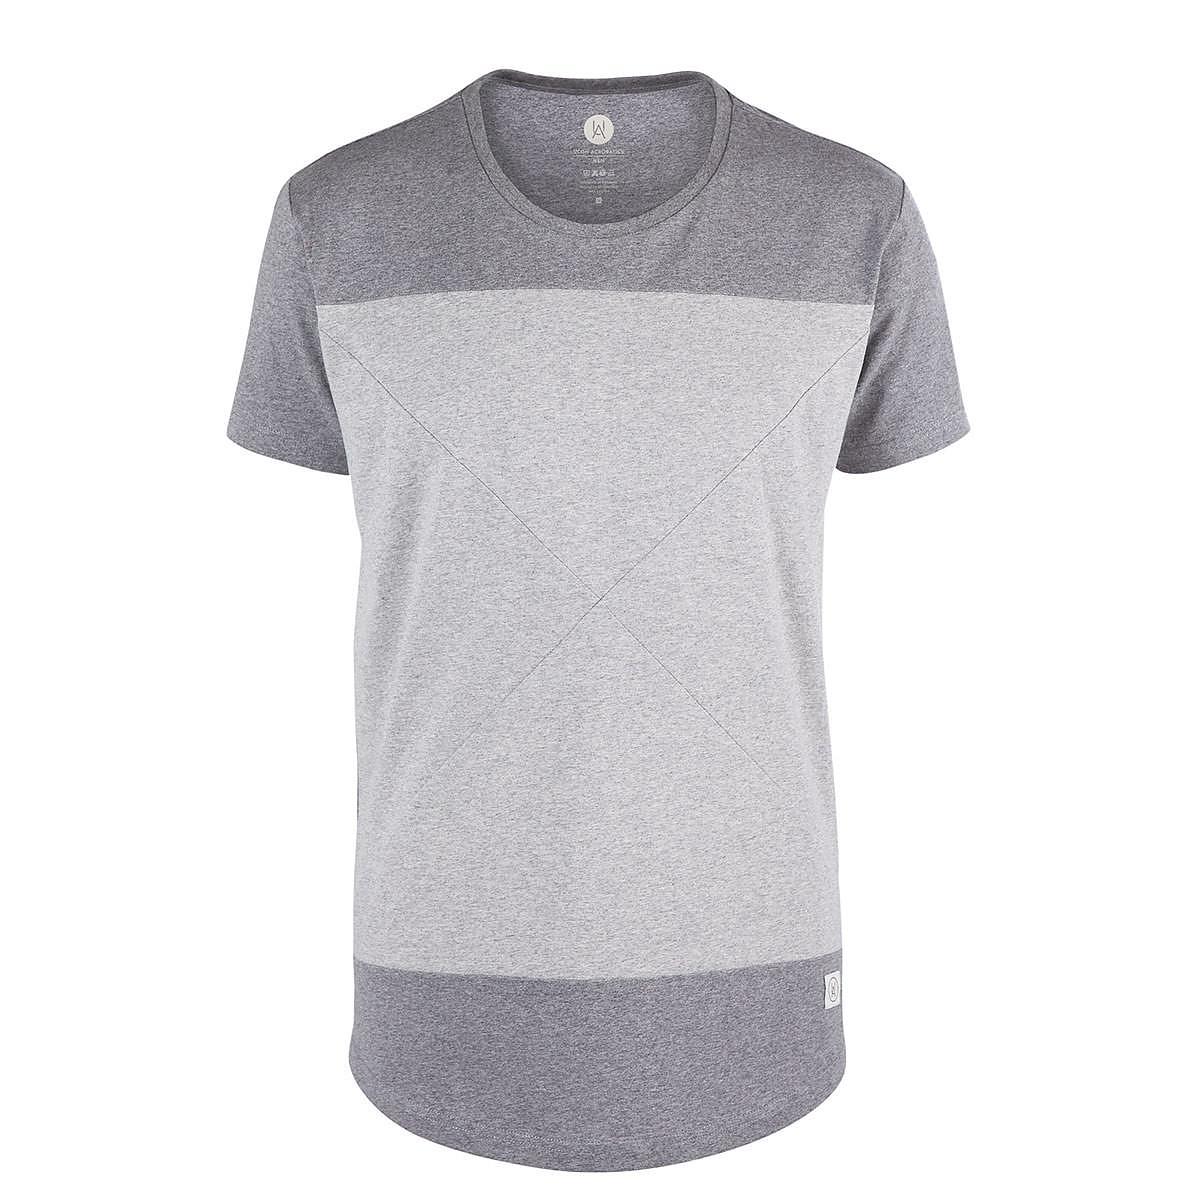 Minimal modern T-Shirts by Ucon Acrobatics.